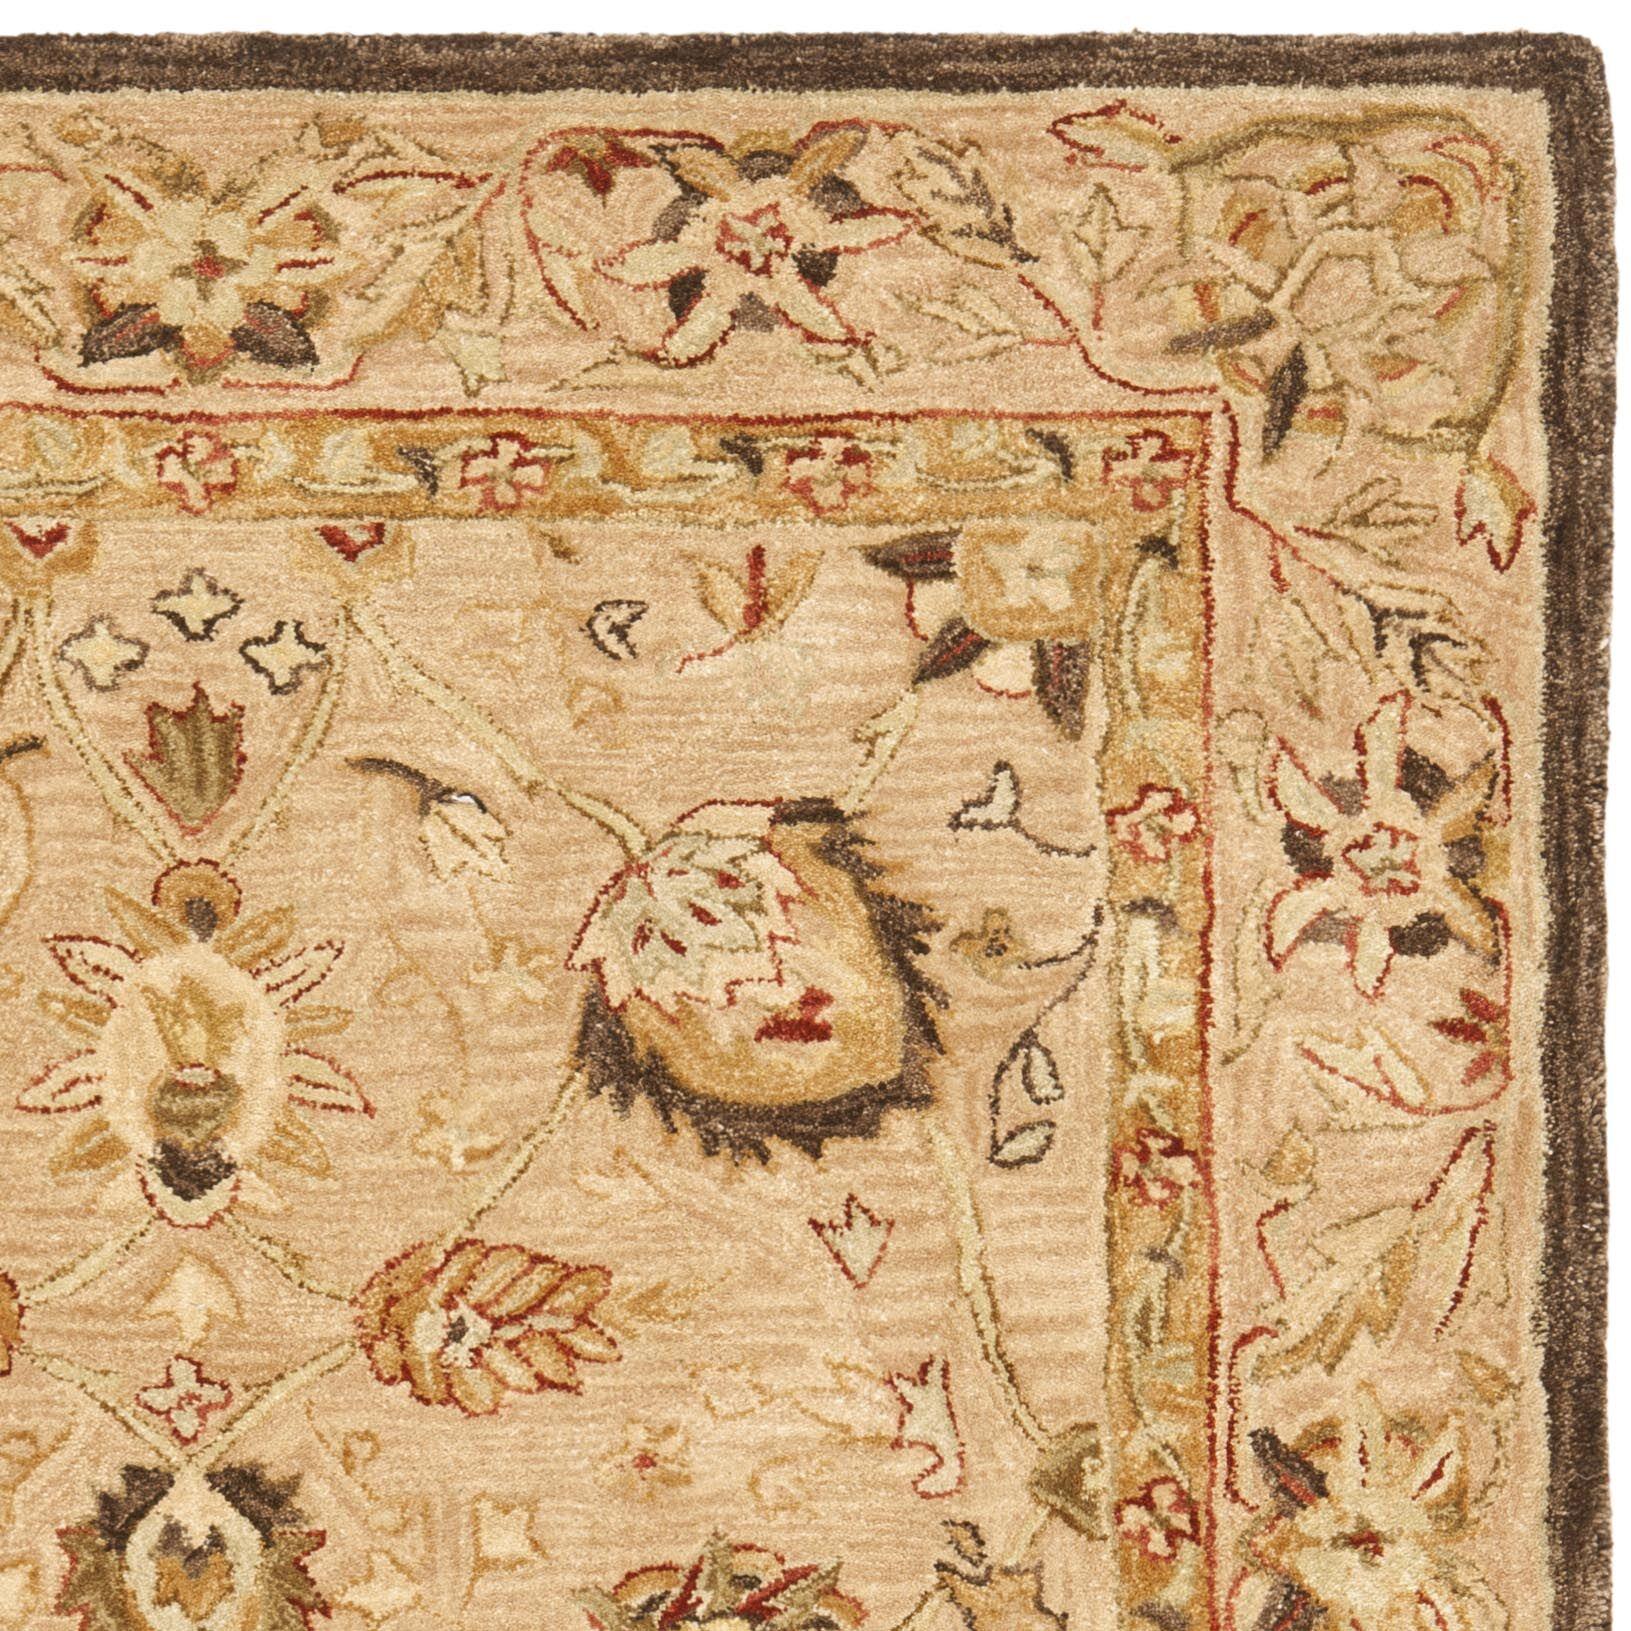 Anatolia Hand-Woven Wool Brown Area Rug Rug Size: Rectangle 9'6